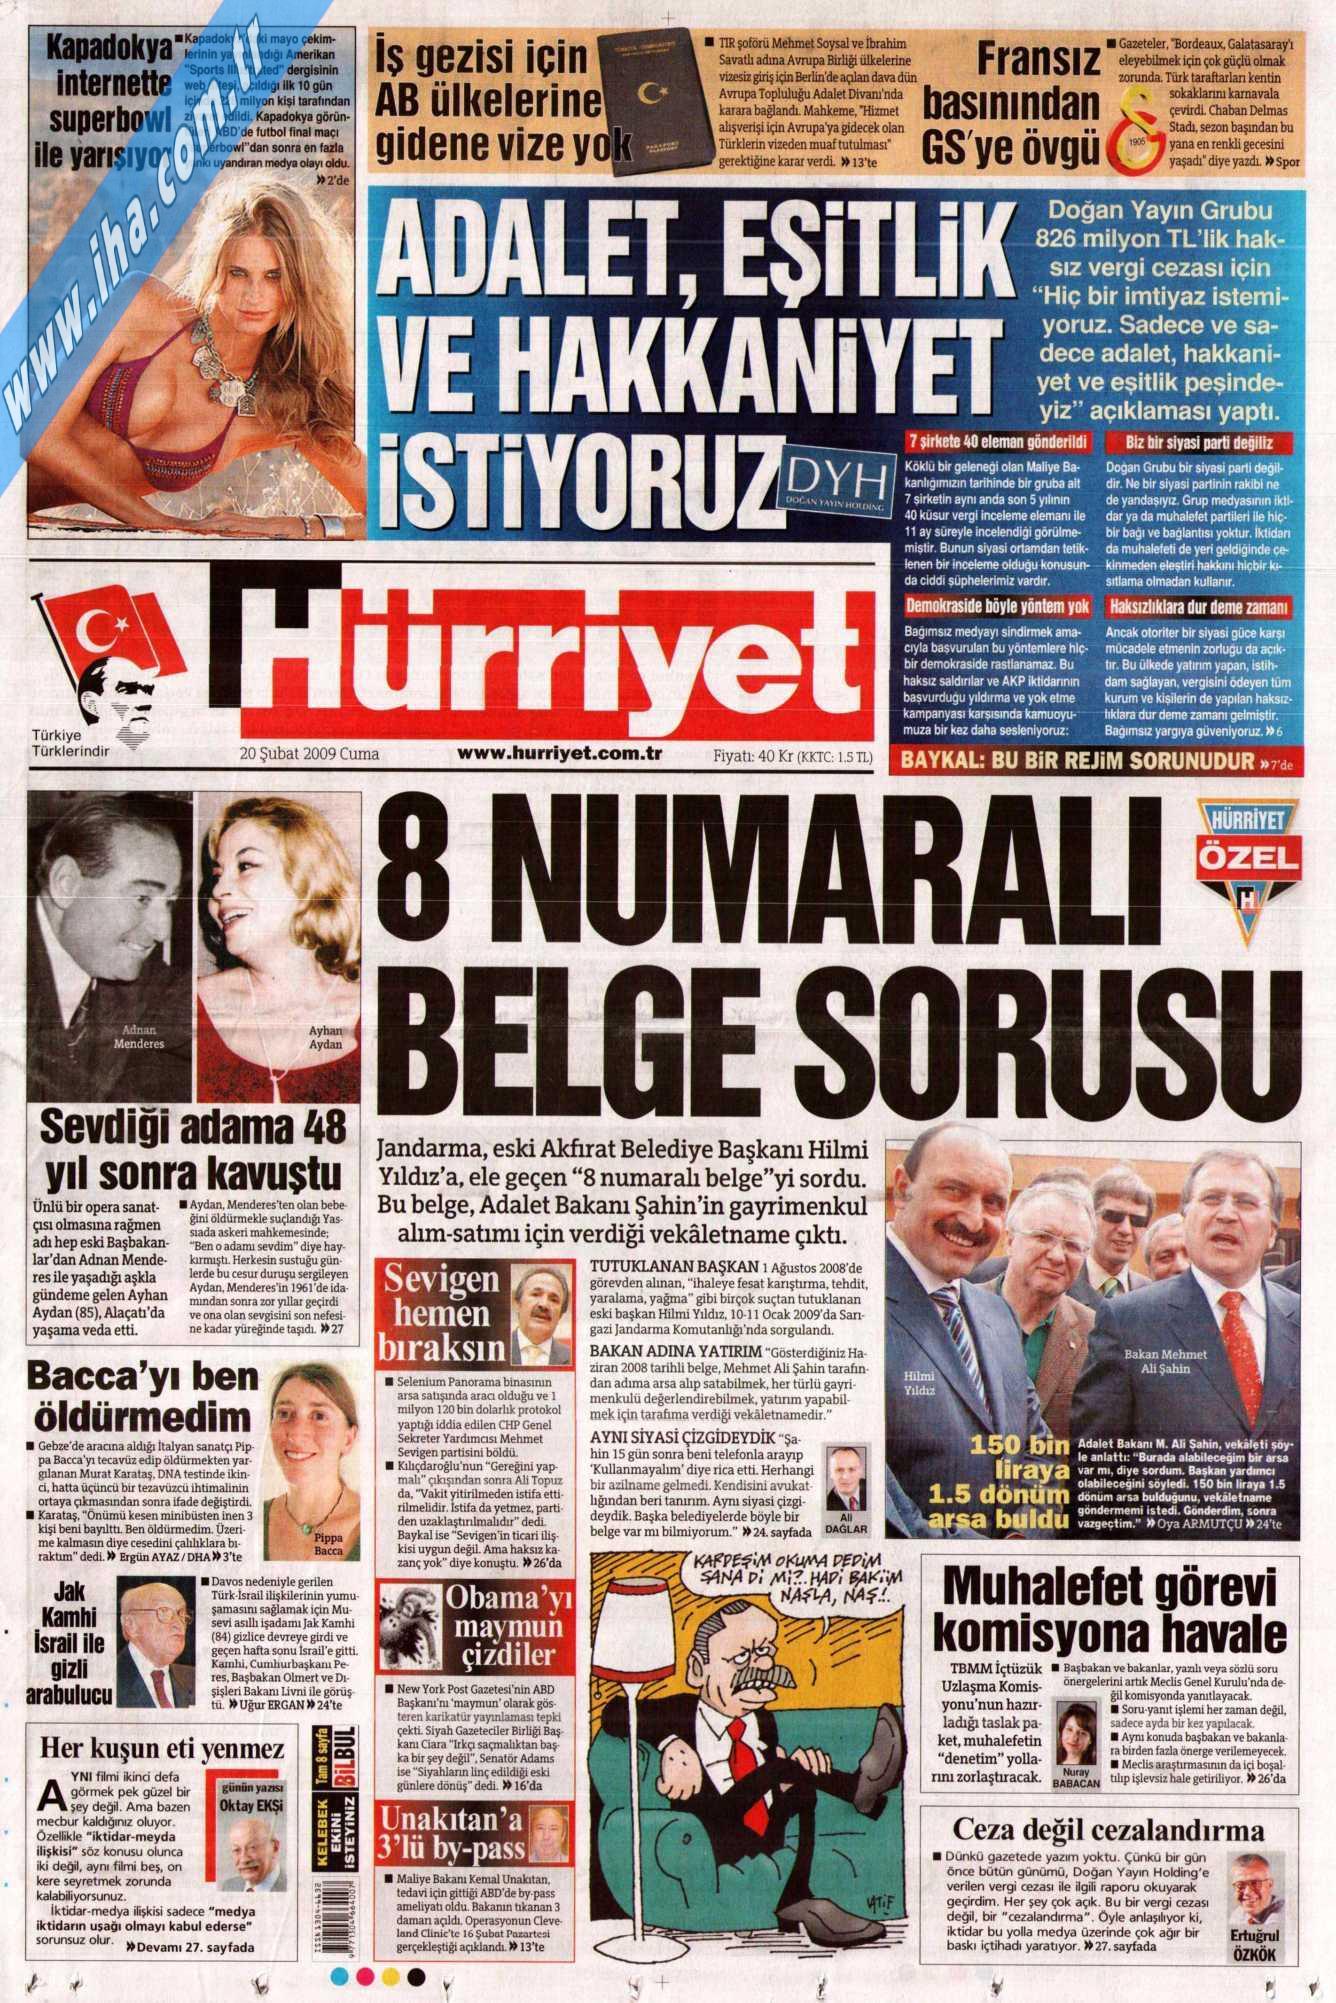 20 Ubat 2009 Cuma Trkiye Gazetesi Sabah Hrriyet